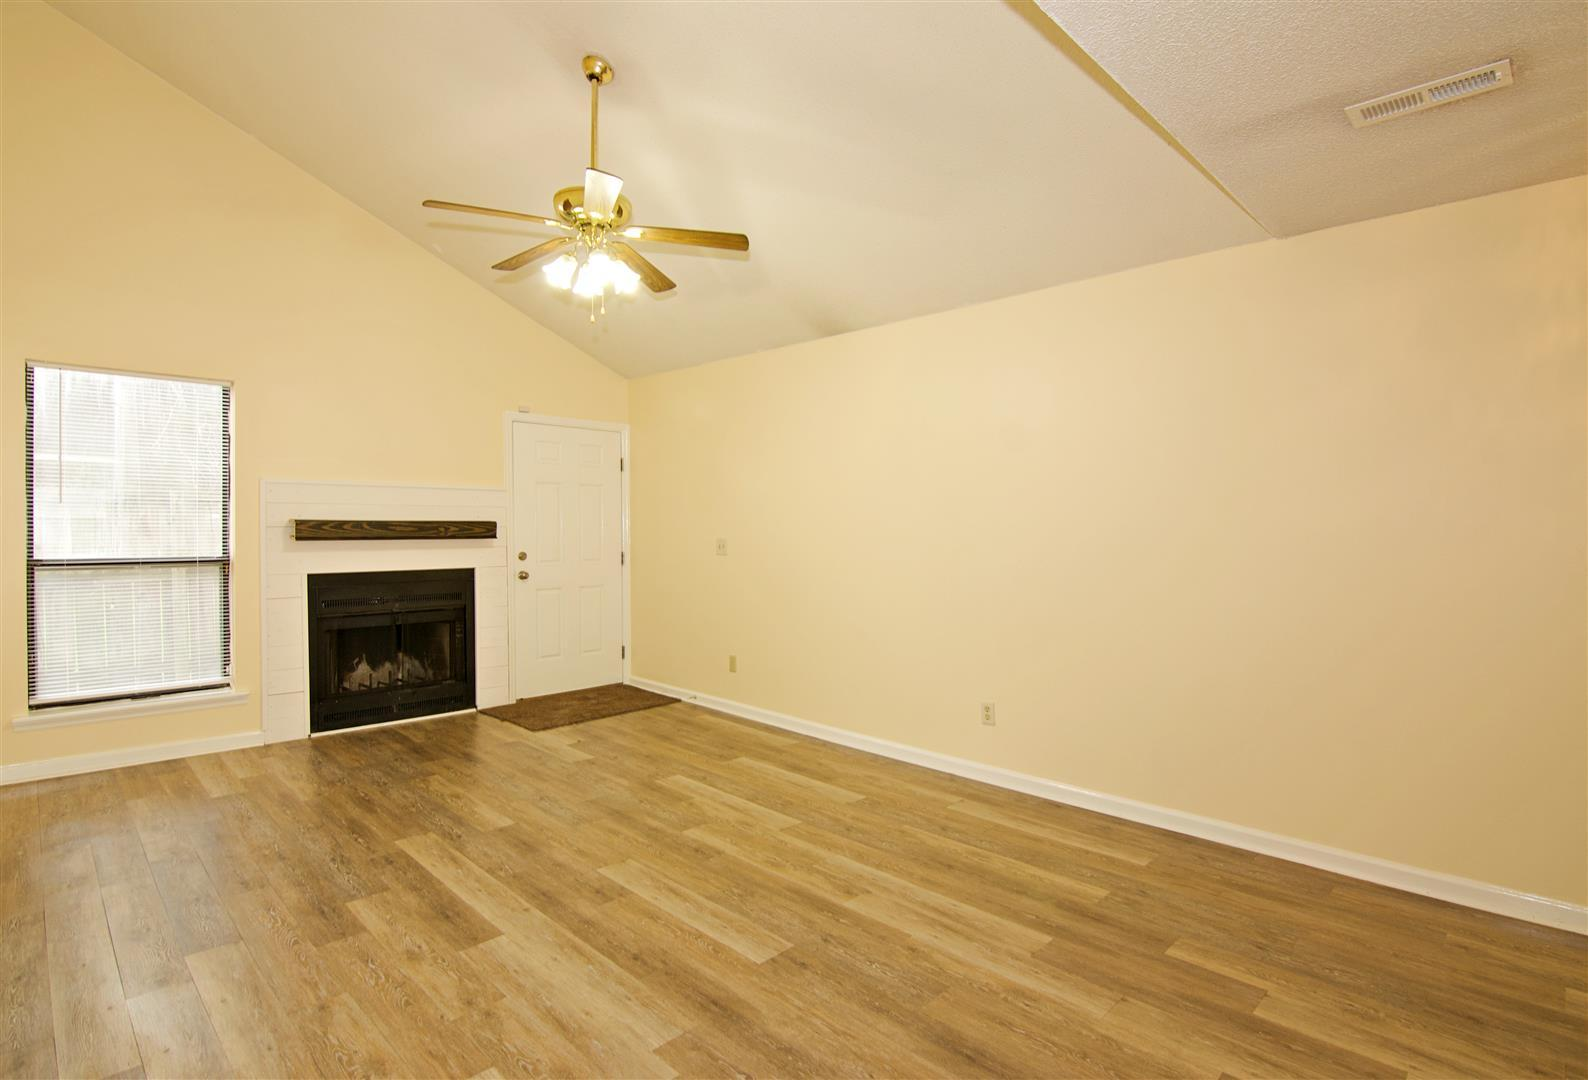 Shaftesbury Woods Homes For Sale - 931 Estates, Charleston, SC - 21